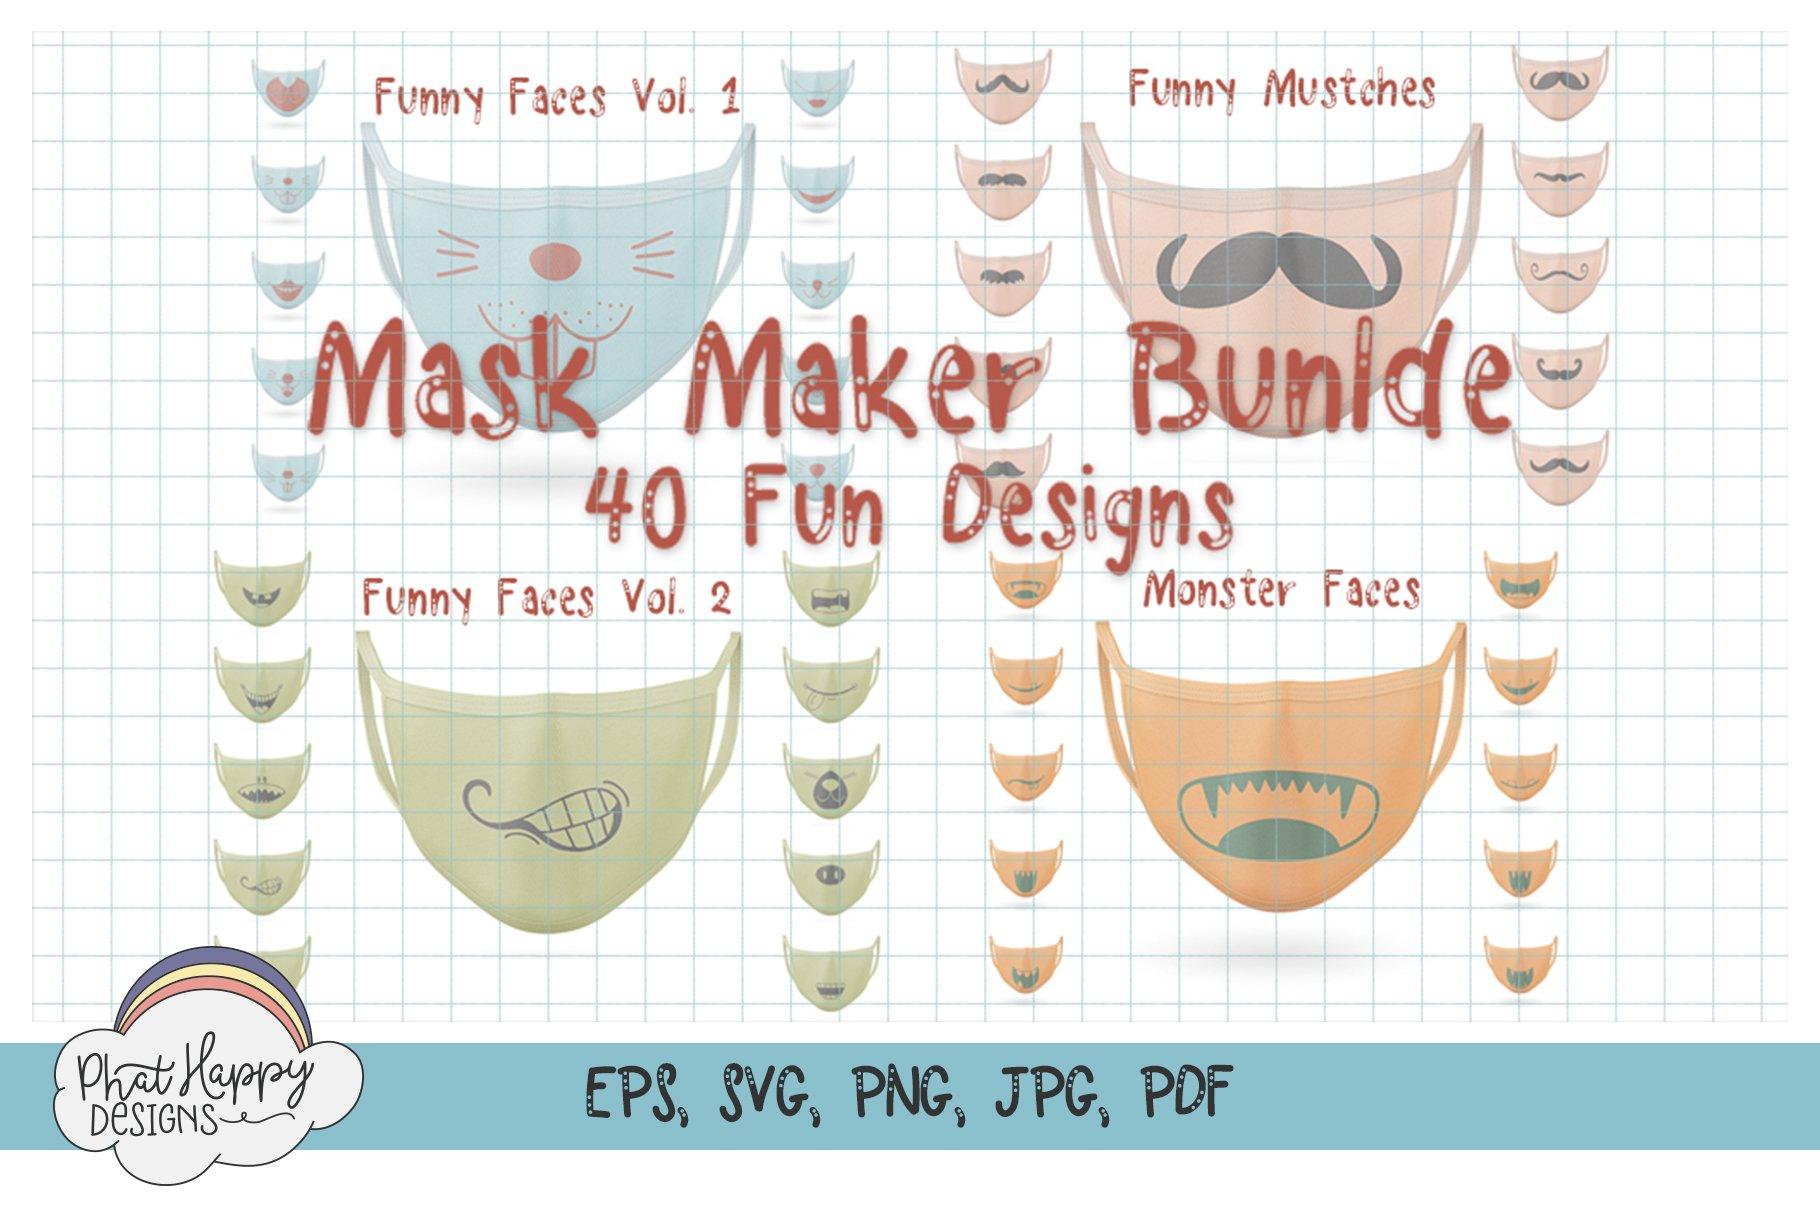 Funny Faces for Masks 40 Design Bundle - SVG Cut Files example image 1